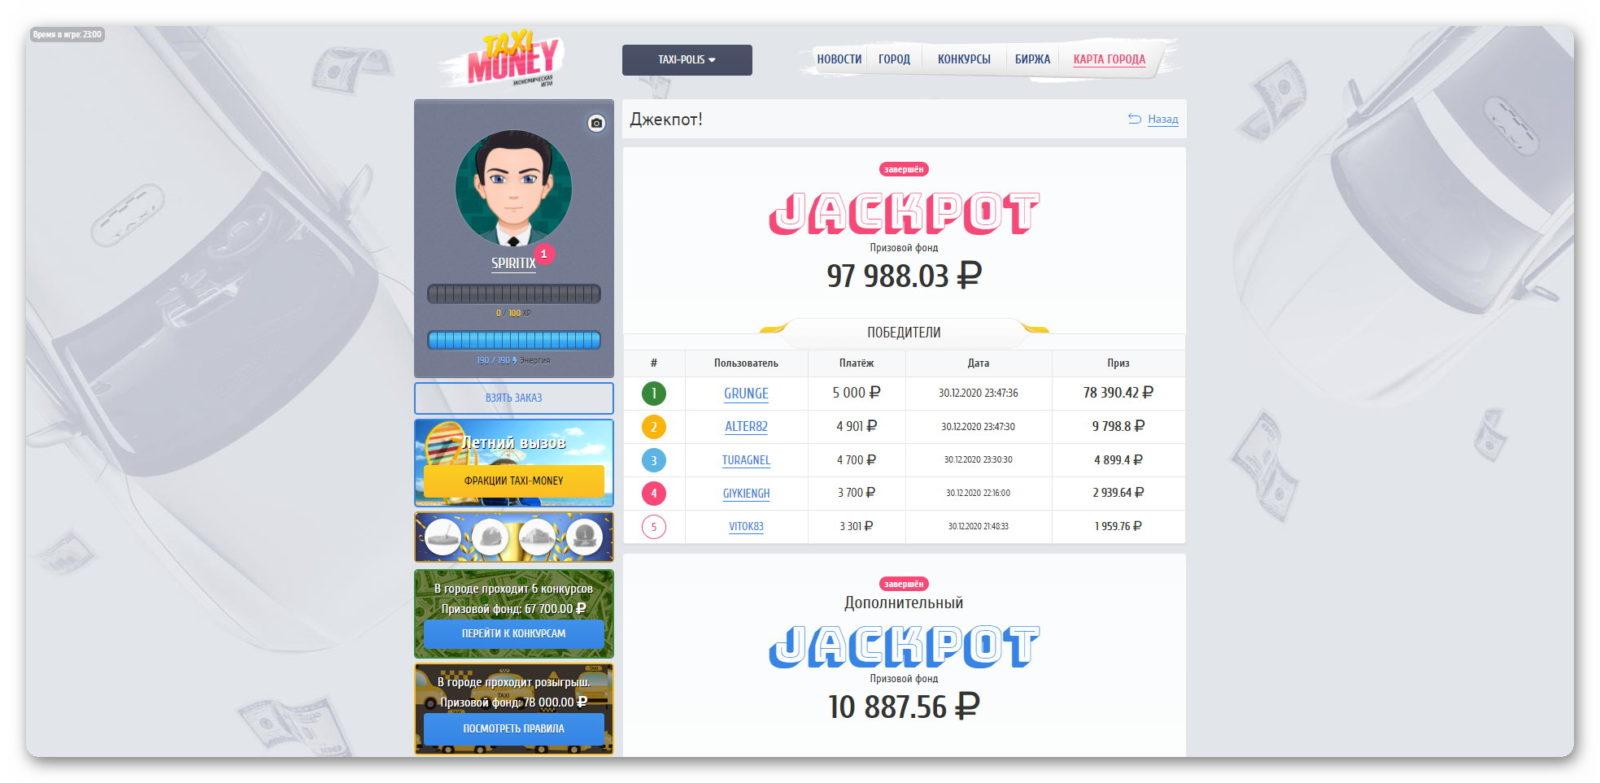 Jackpot в игре Taxi-Money